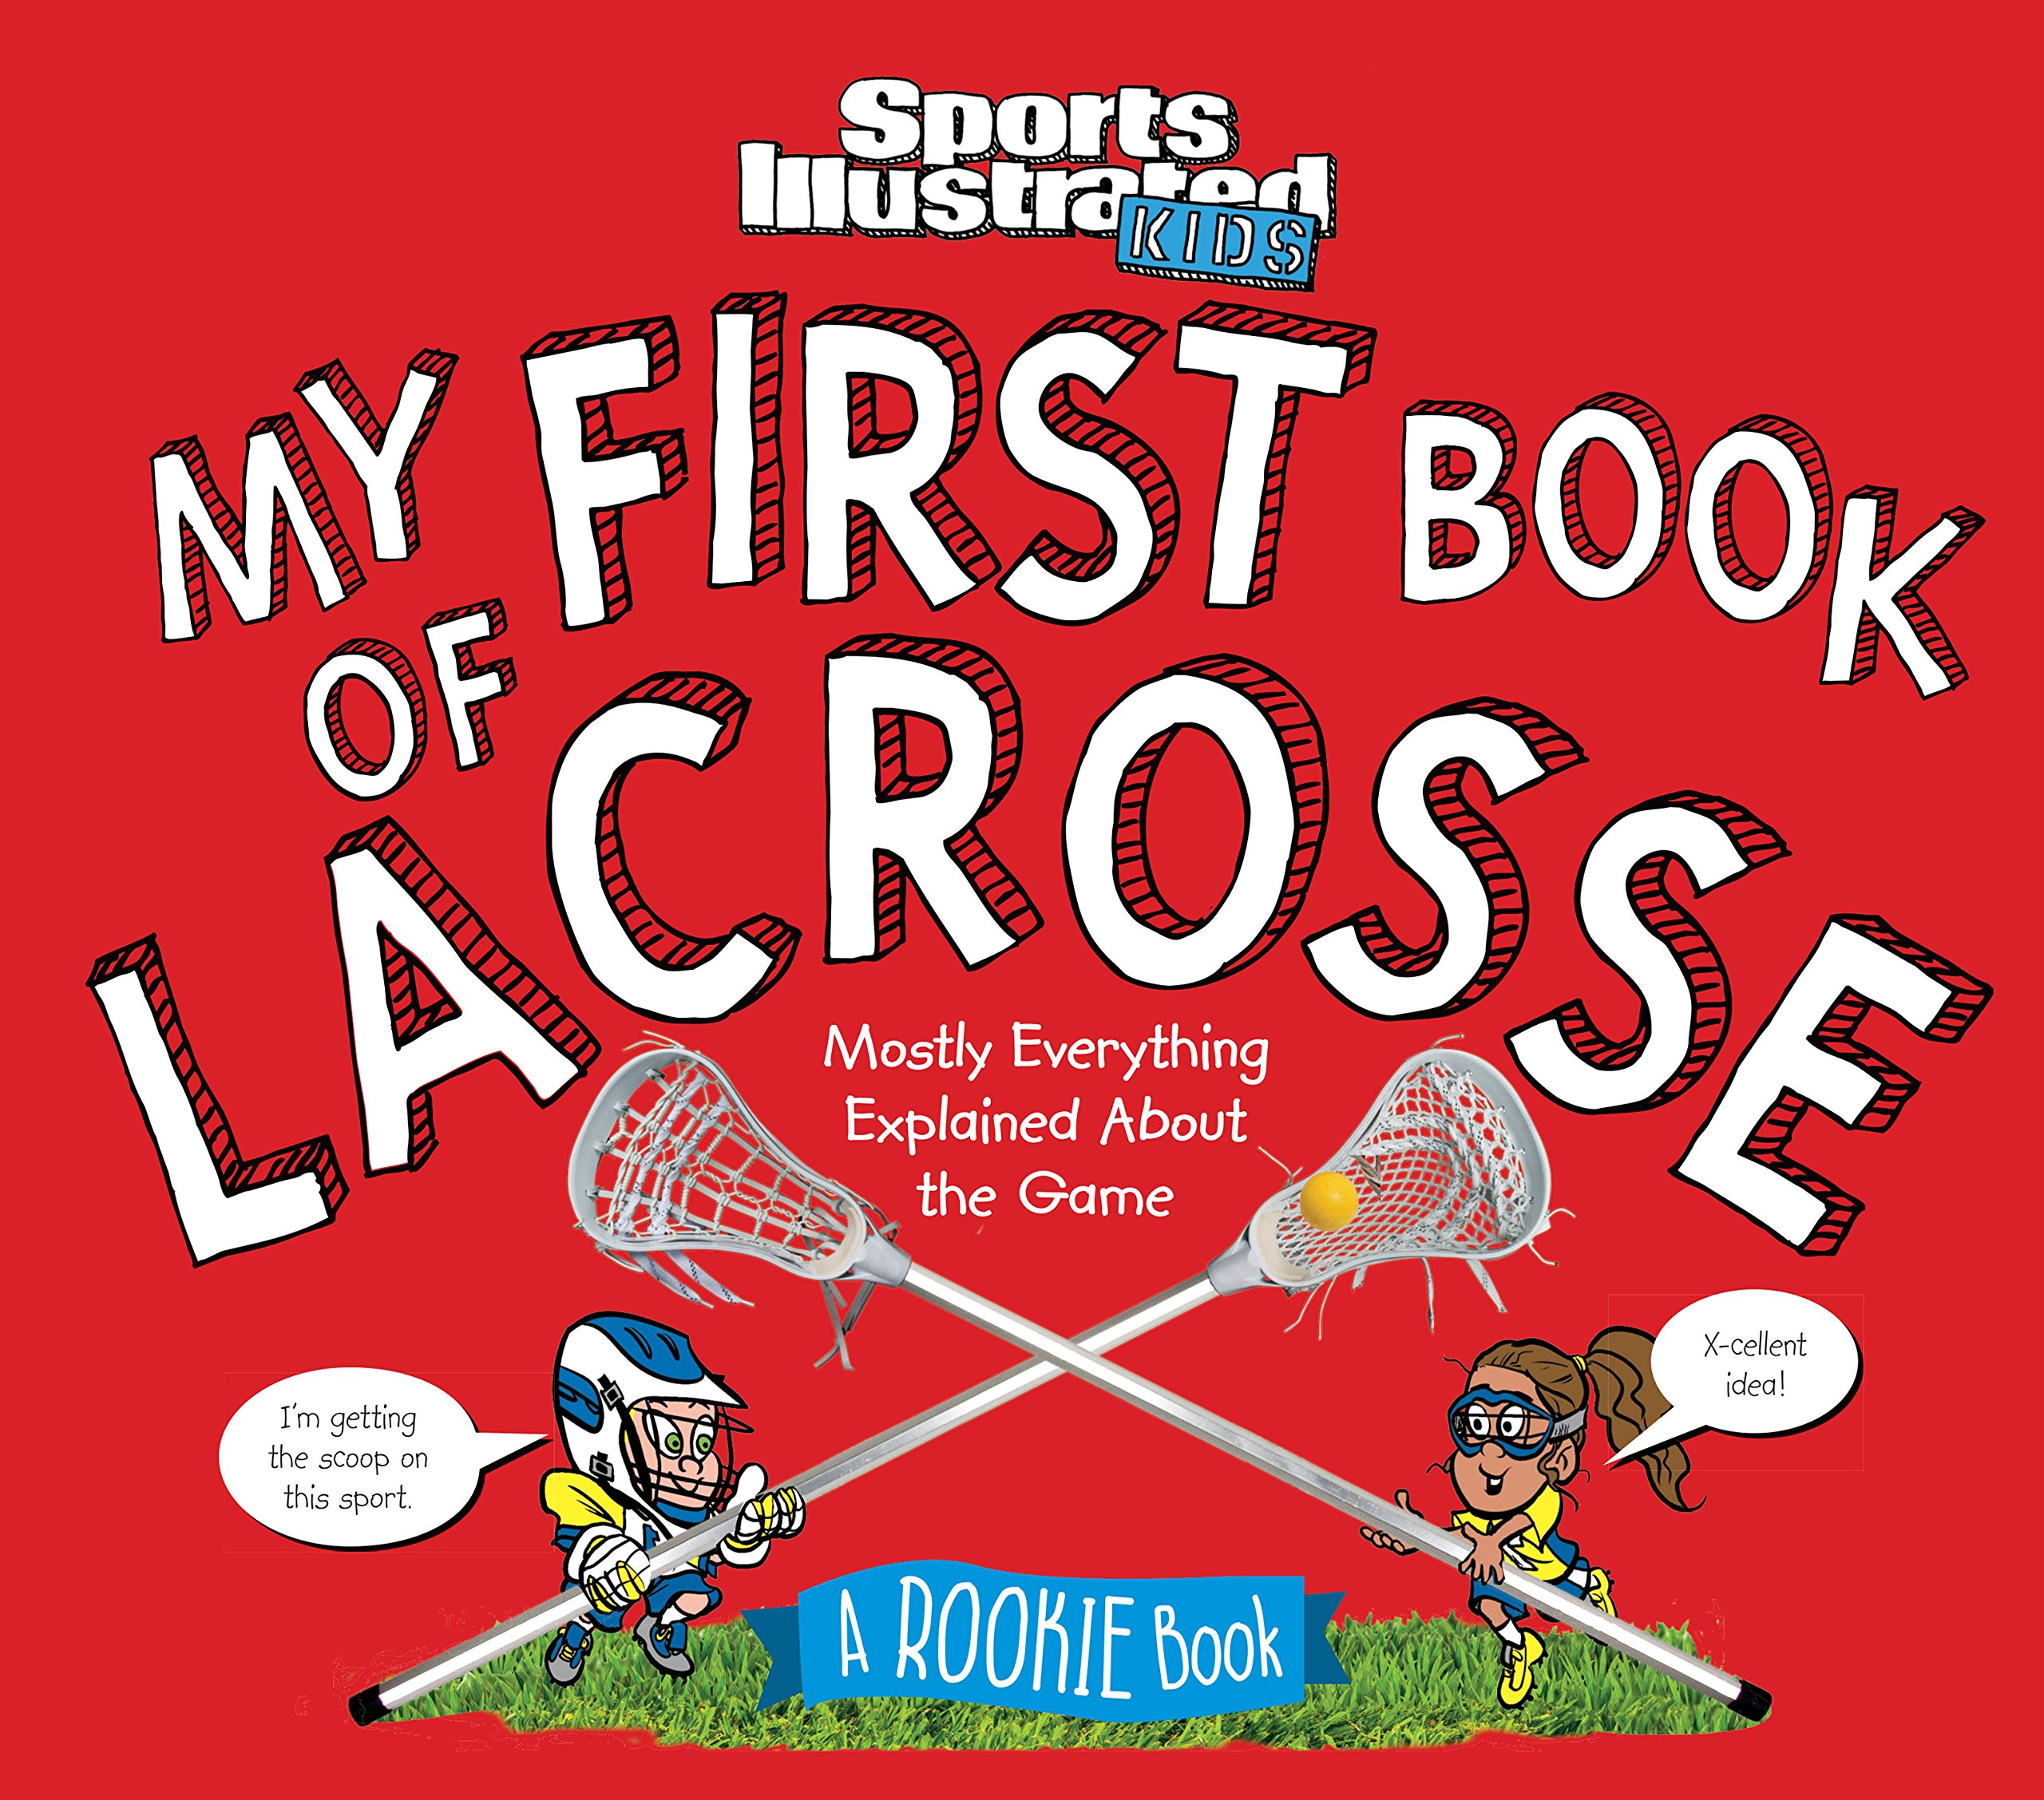 My First Book of Lacrosse: A Rookie Book (A Sports Illustrated Kids Book) (Sports Illustrated Kids Rookie Books) pdf epub